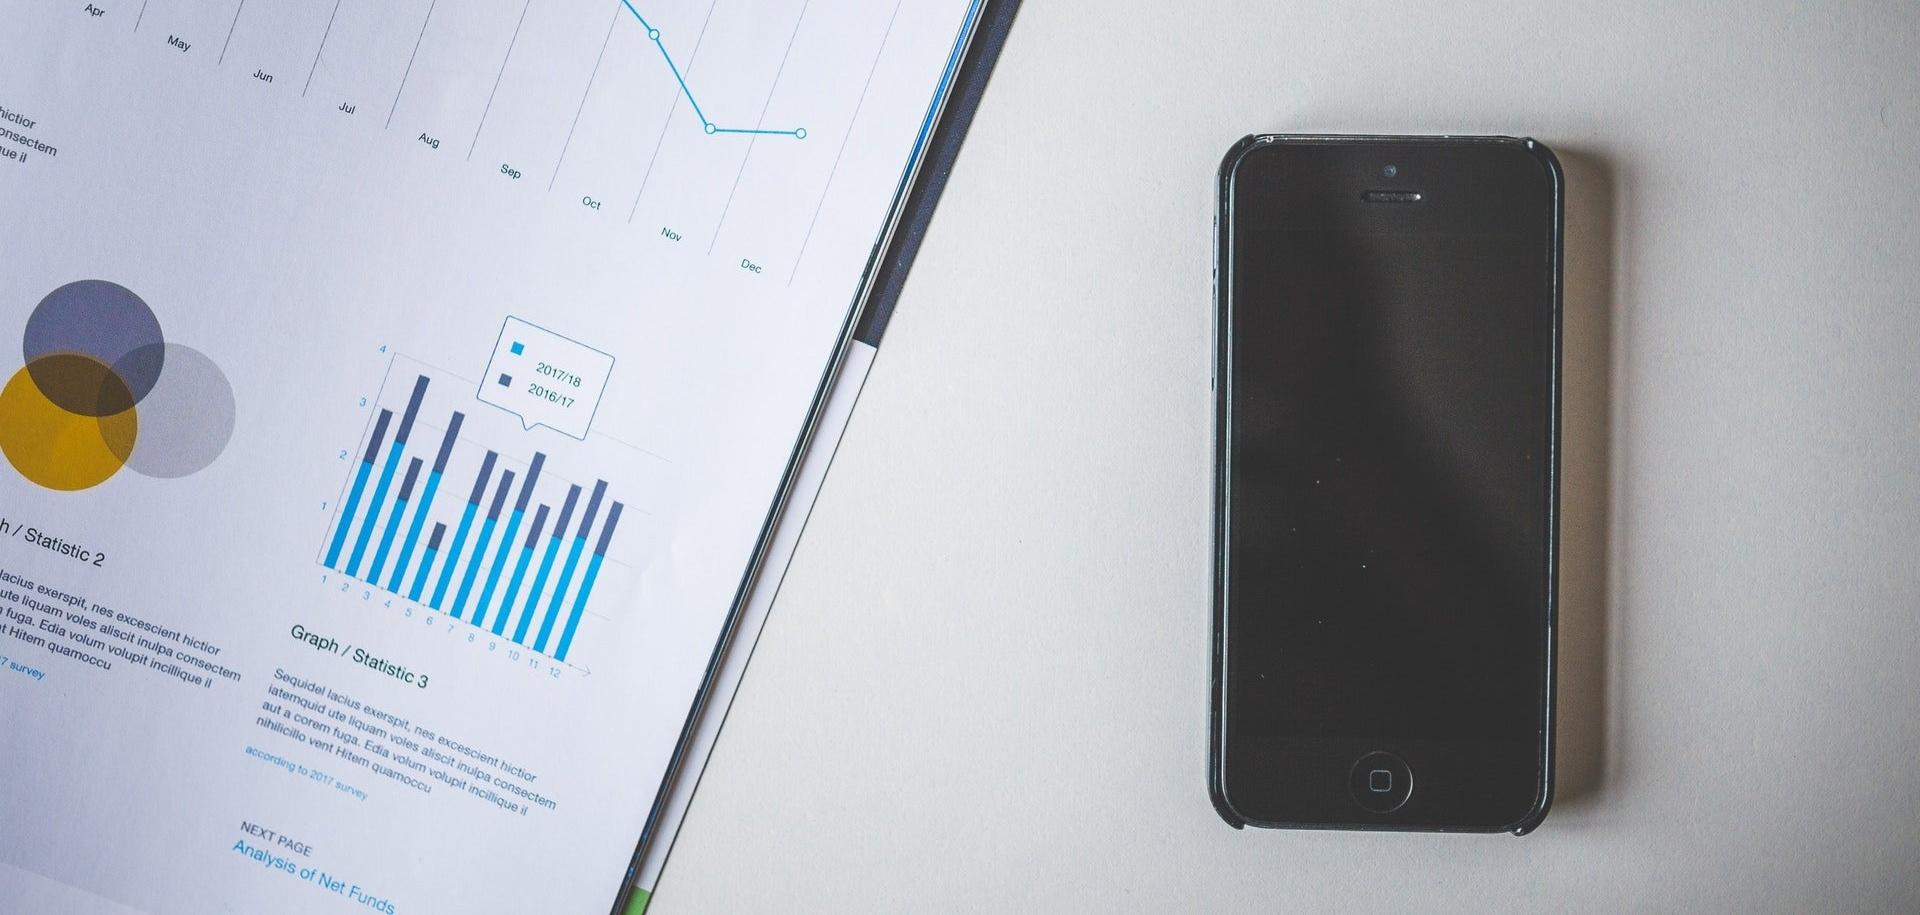 smartphone and document with analytics data-087925-edited